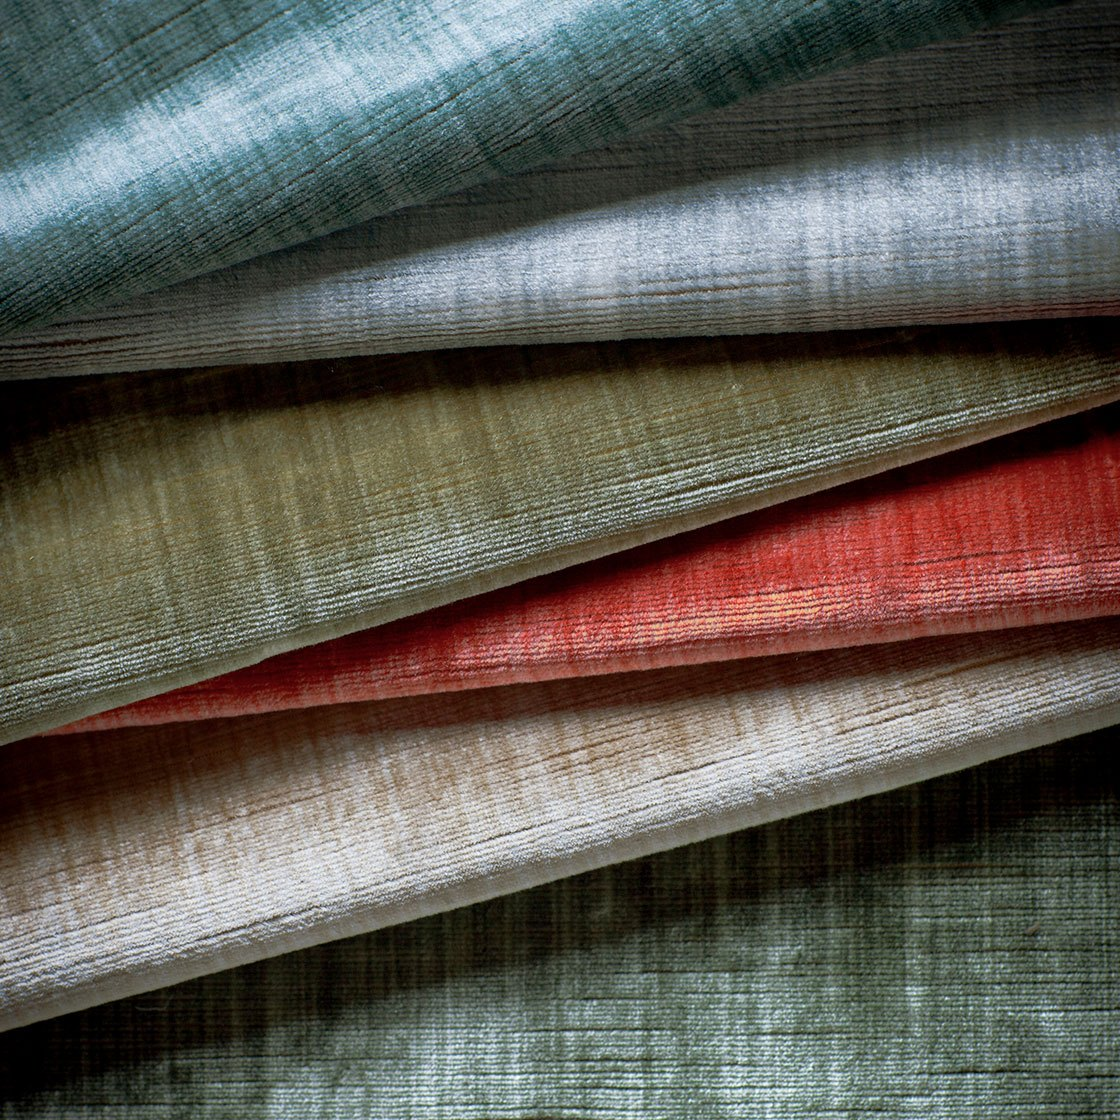 Como Silk Velvet - Group - Beaumont & Fletcher - Beaumont & Fletcher